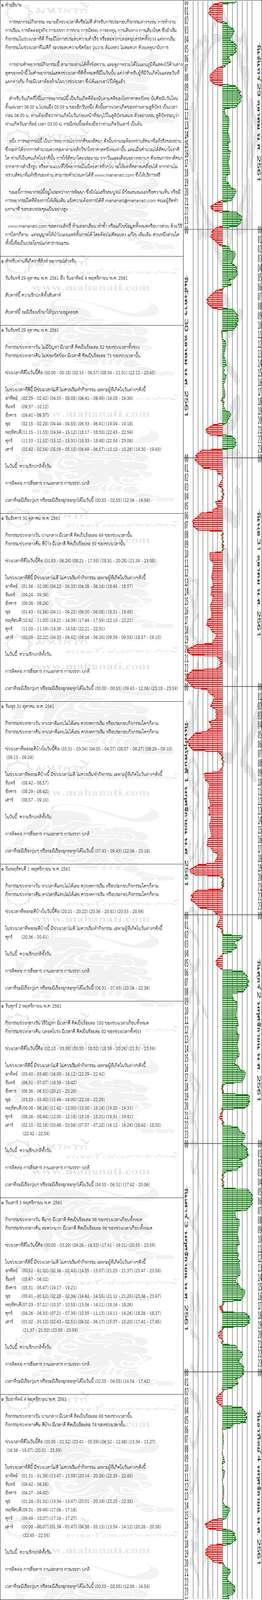 ph3ptyiqvKR8BfBa5Q8-o.jpg